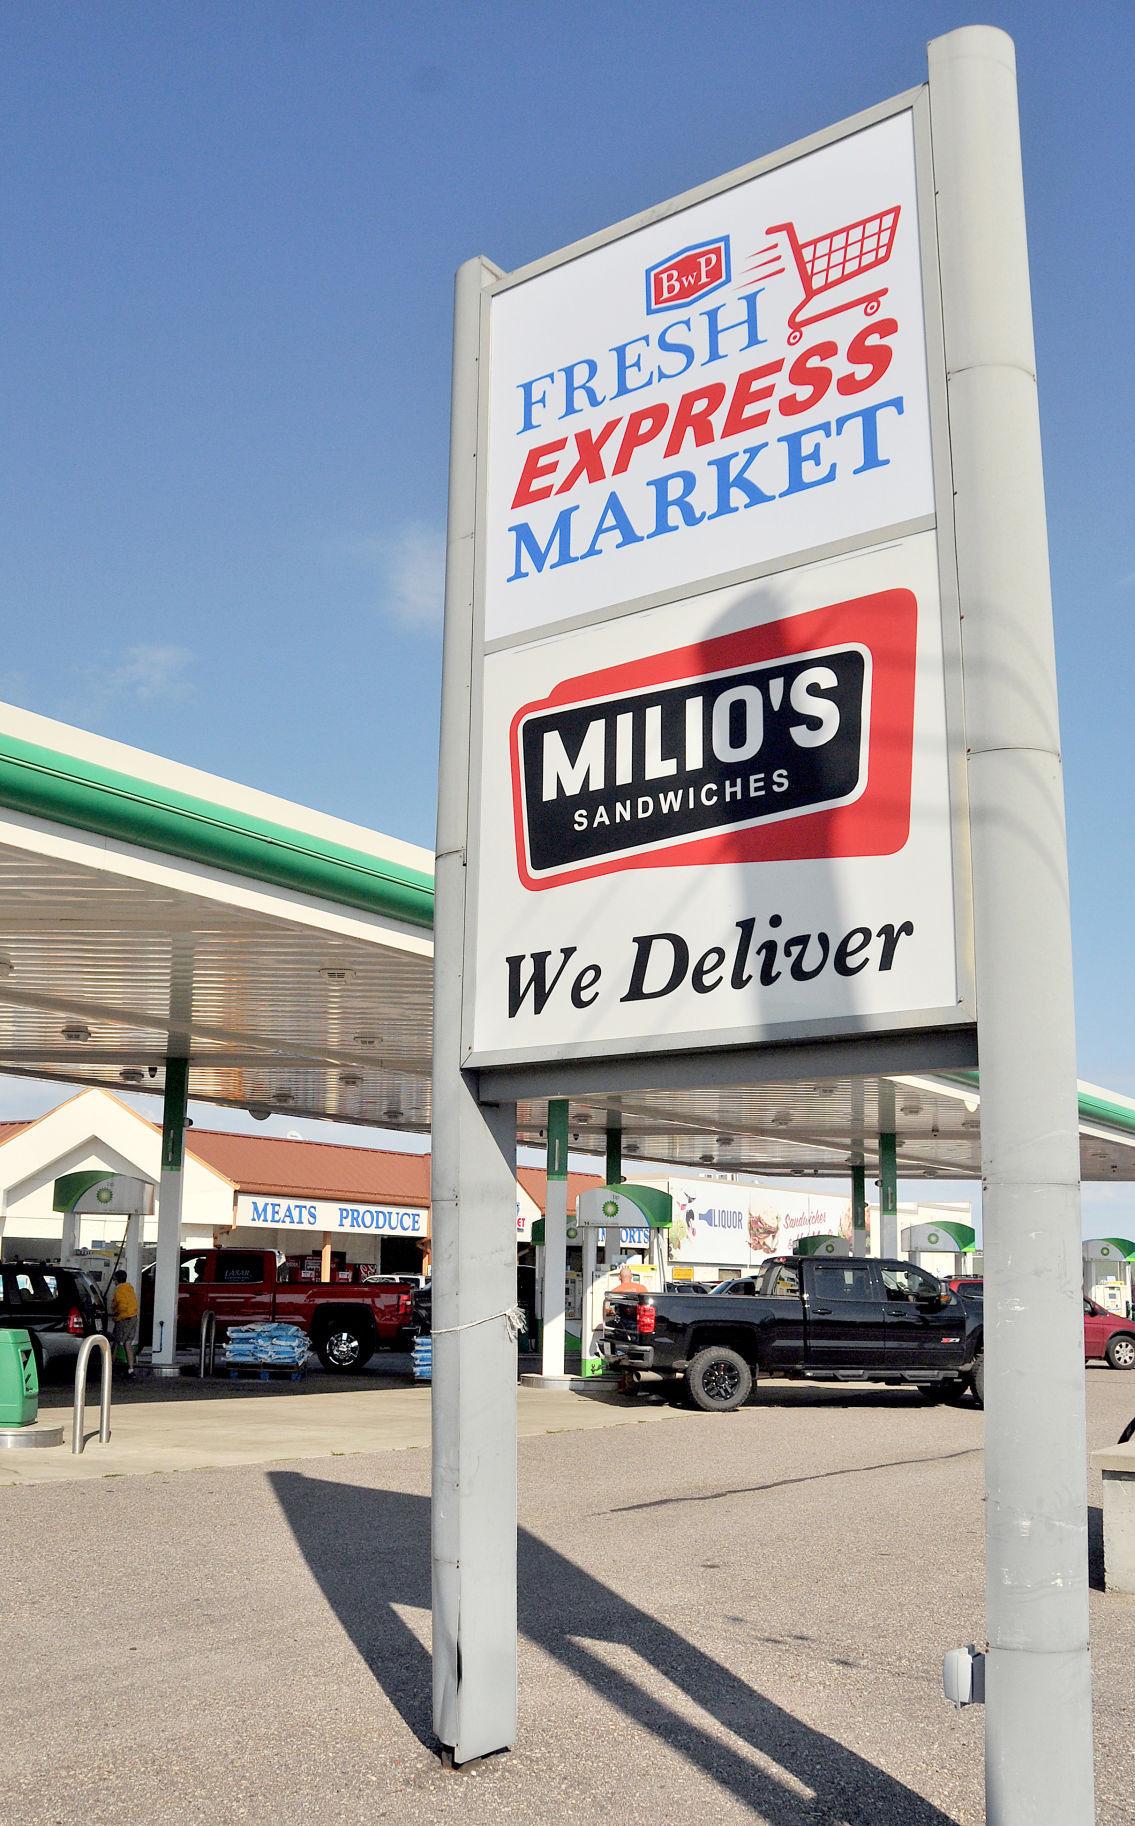 Fresh Express Market